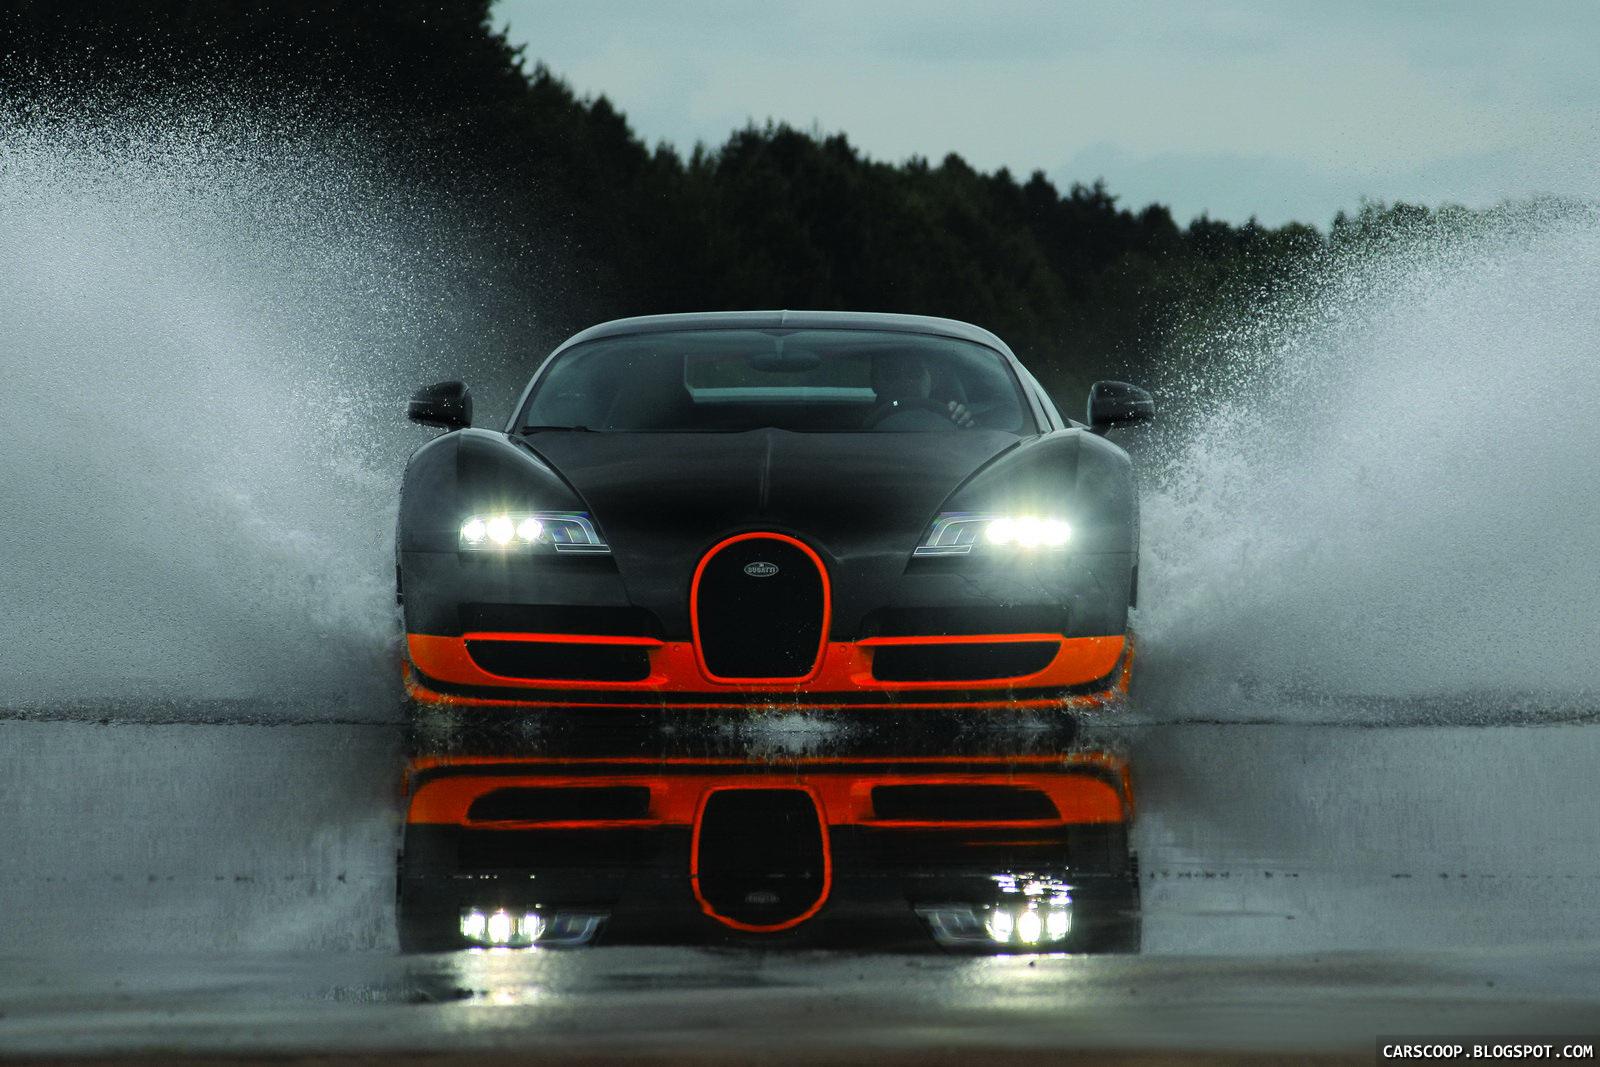 PS Bugatti Veyron Super Sport Topspeed kmh